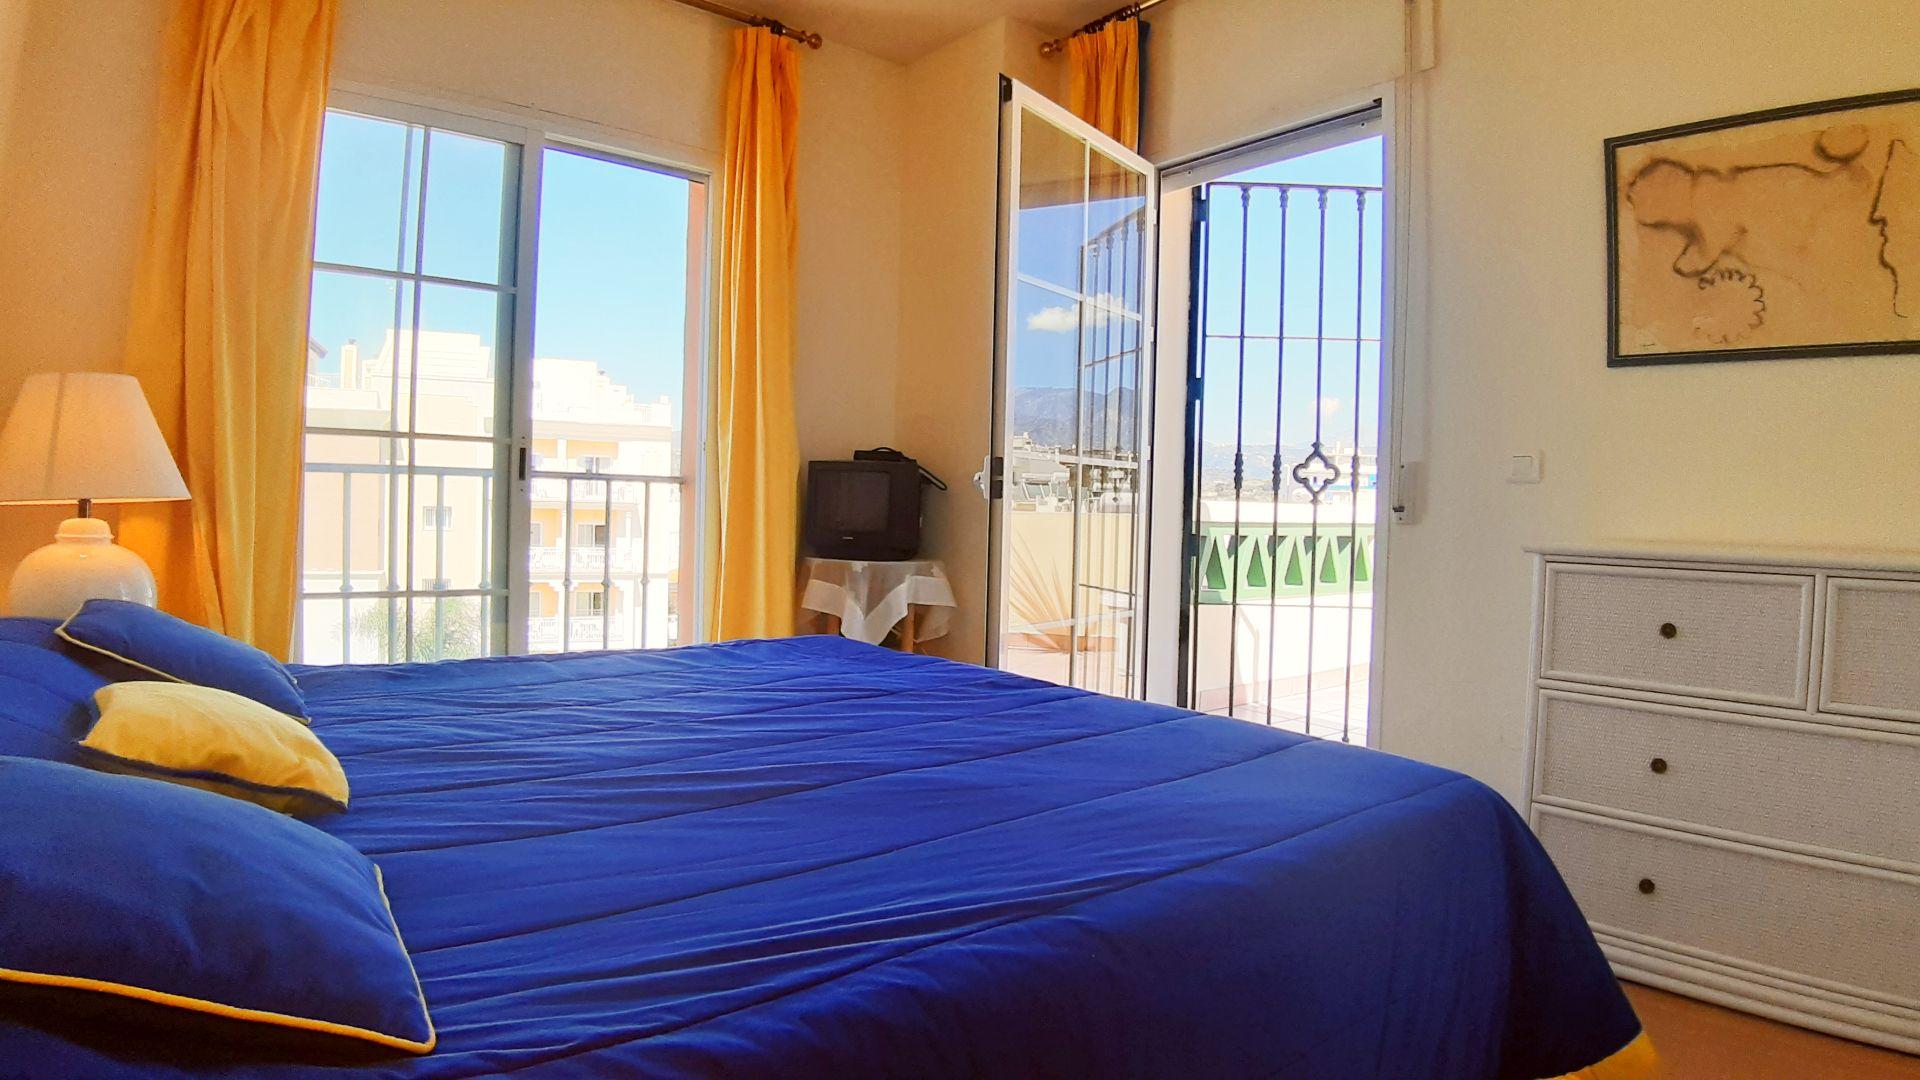 Penthouse in Nerja, Torrecilla, for sale